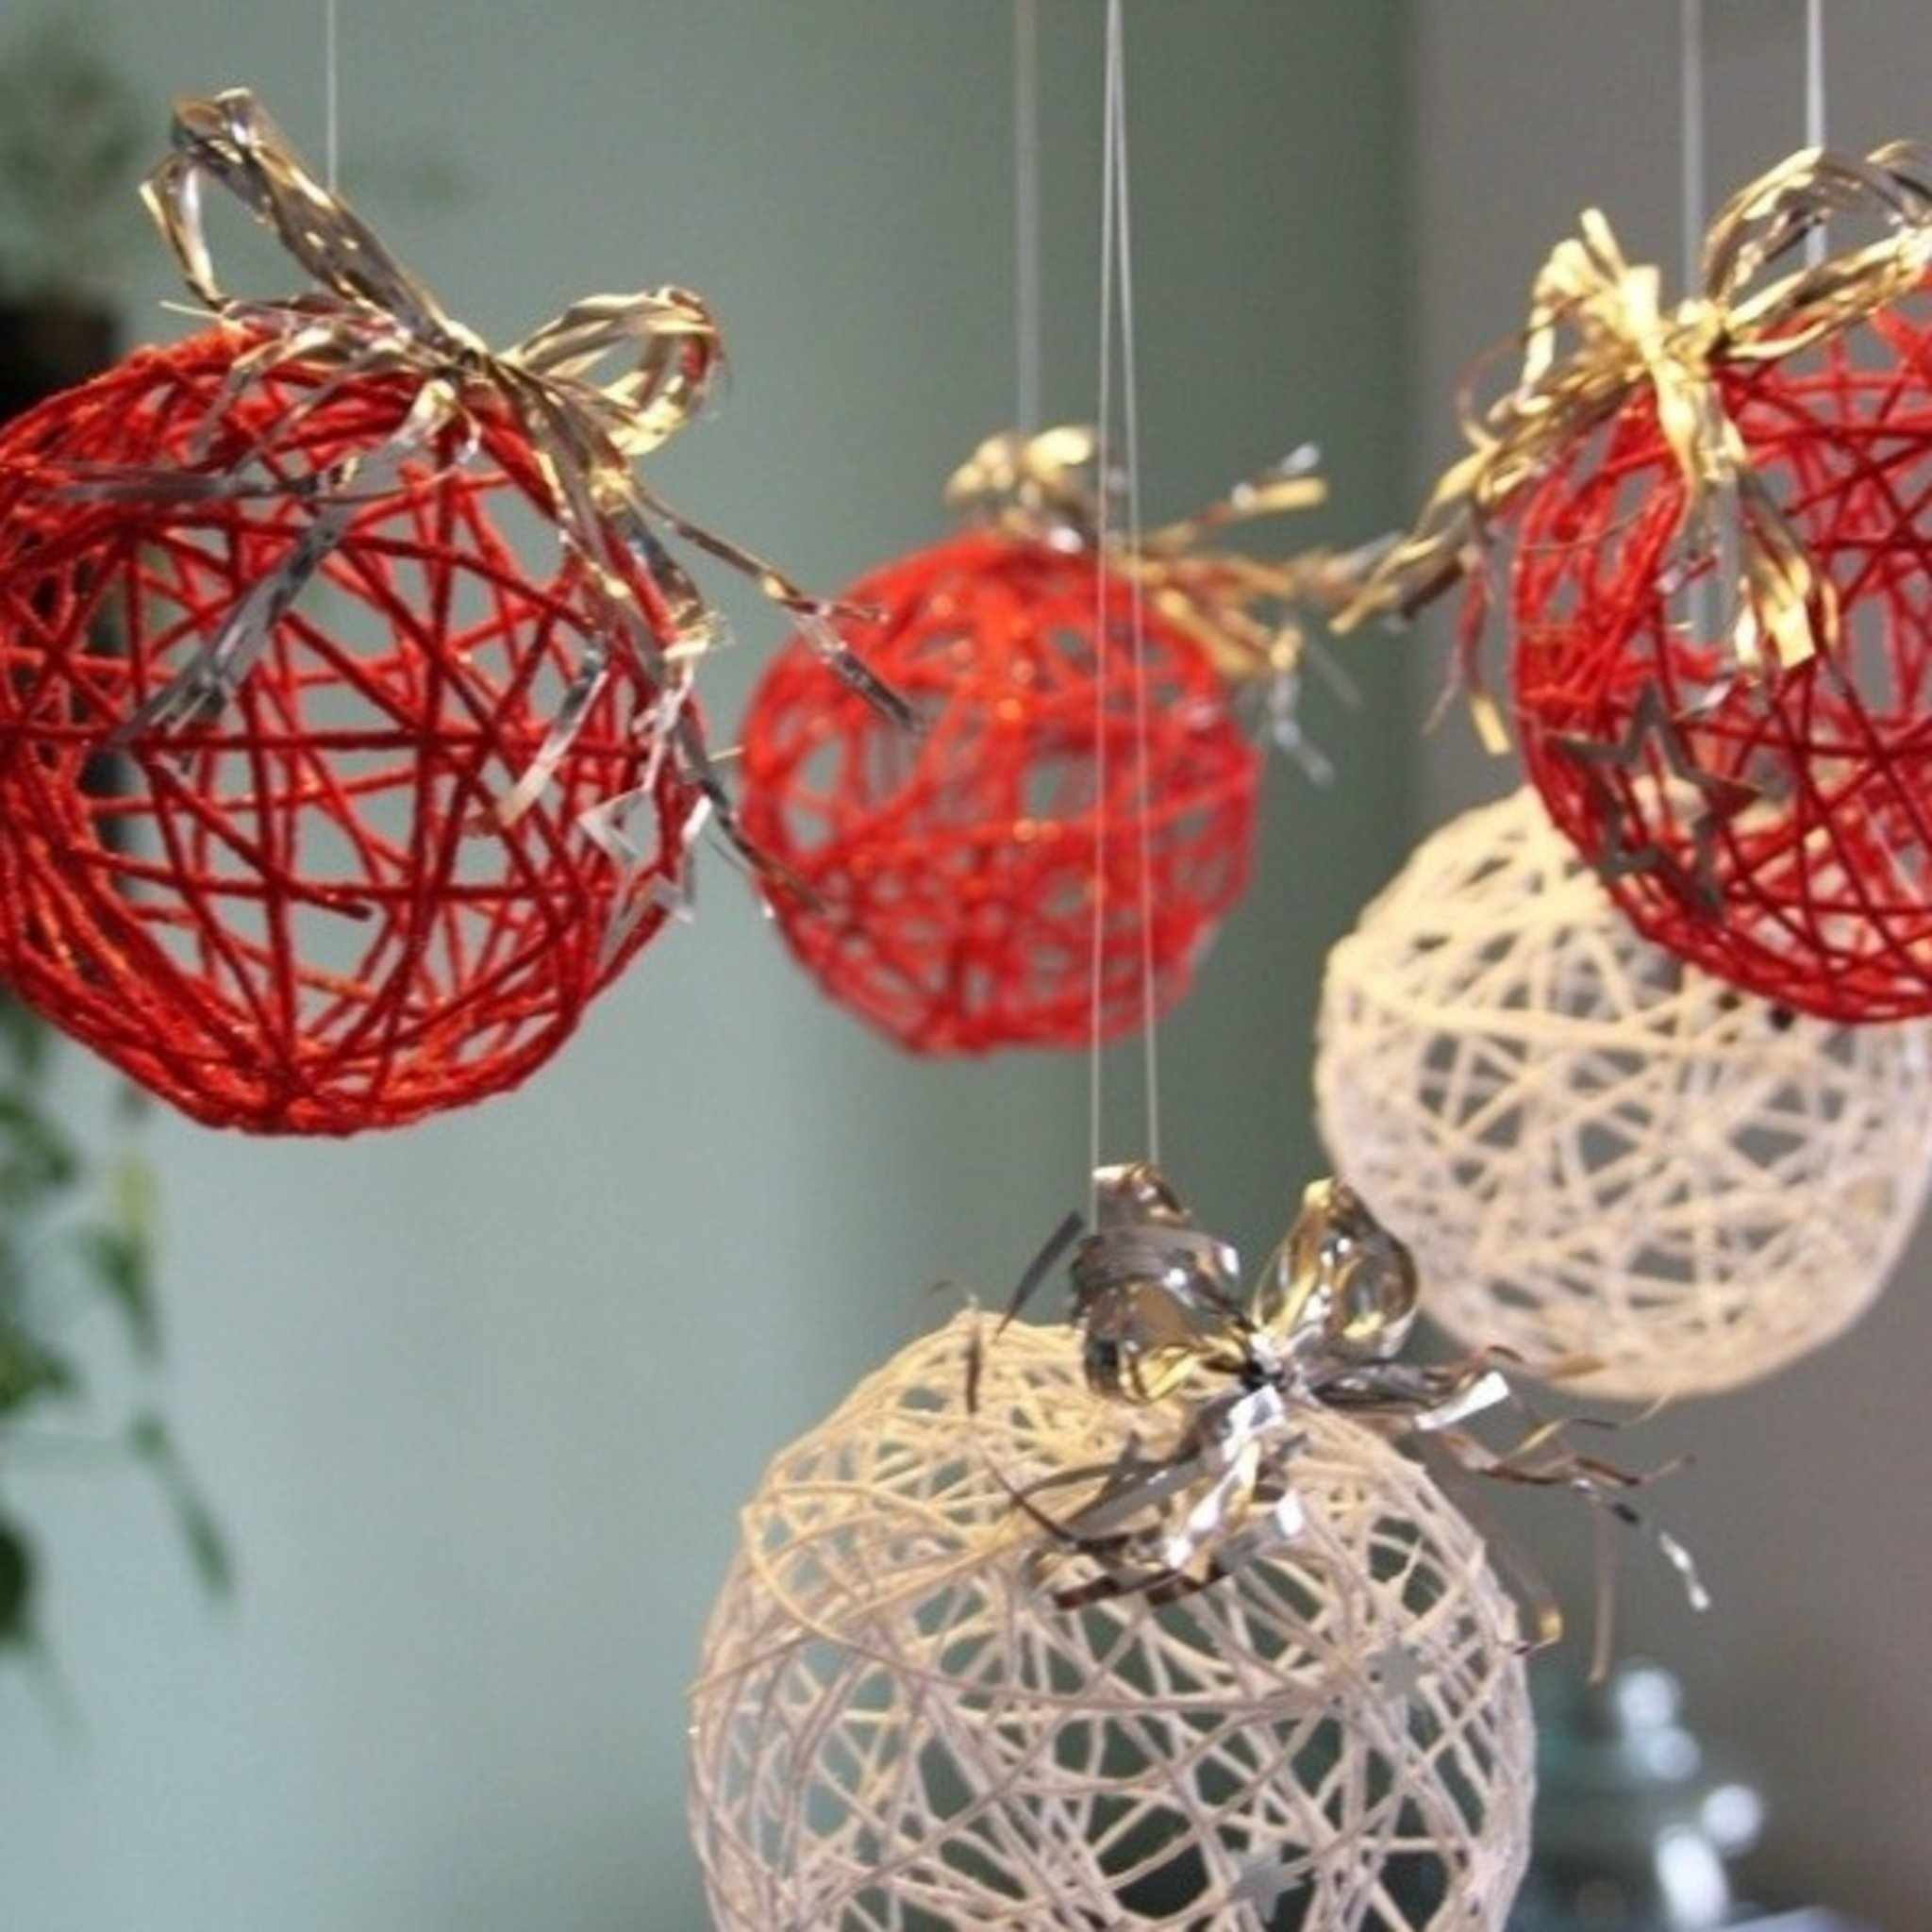 Праздничная композиция с шарами из ниток